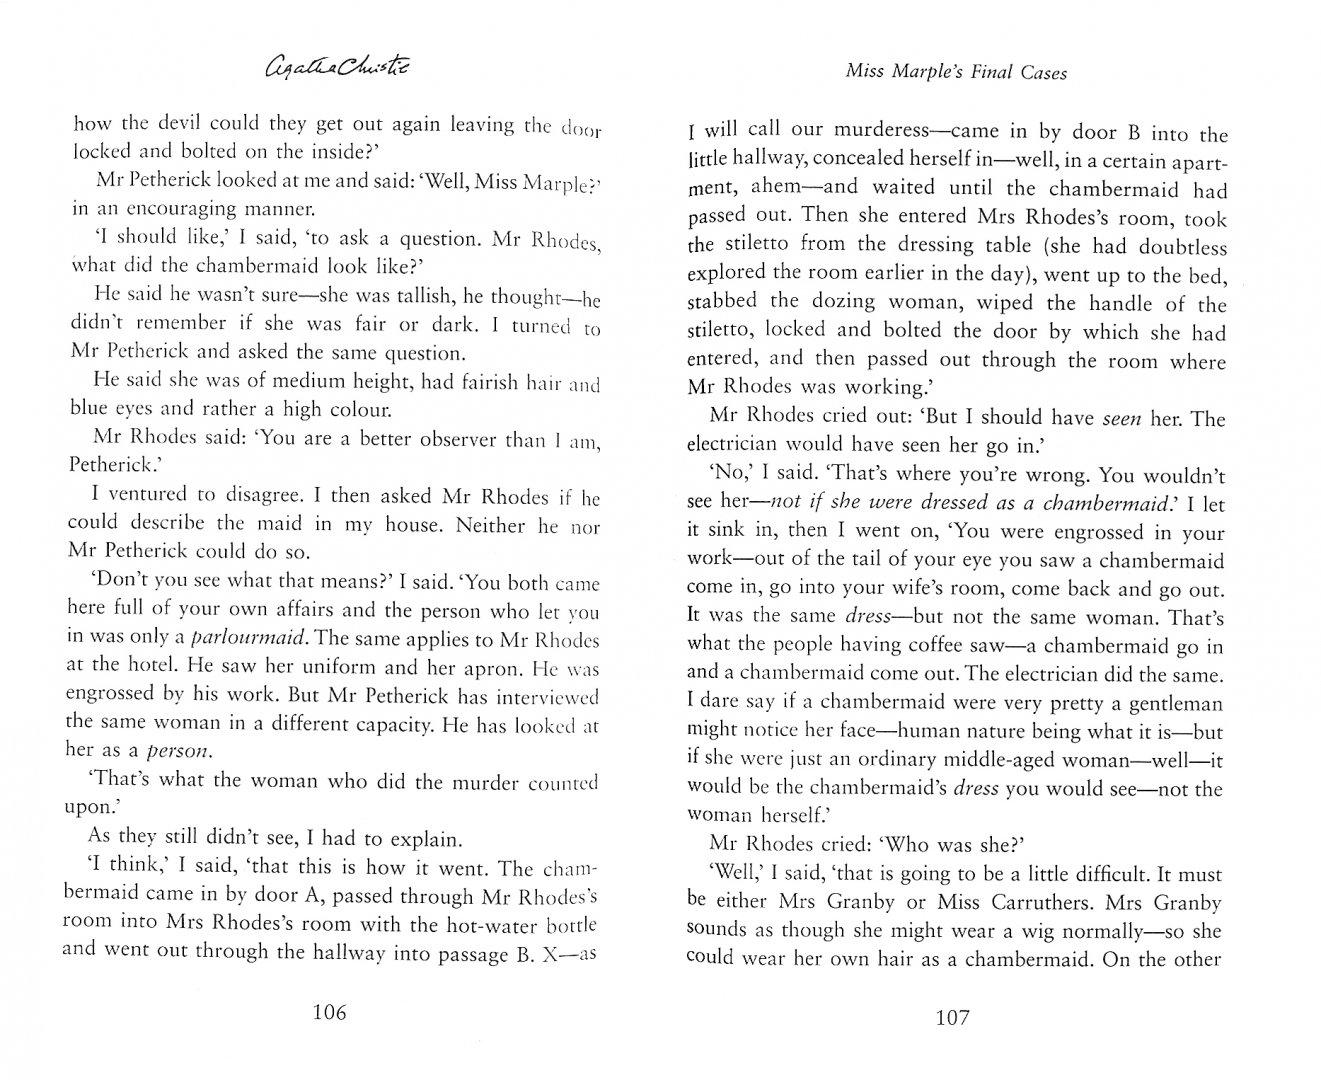 Иллюстрация 1 из 3 для Miss Marple's Final Cases - Agatha Christie   Лабиринт - книги. Источник: Лабиринт